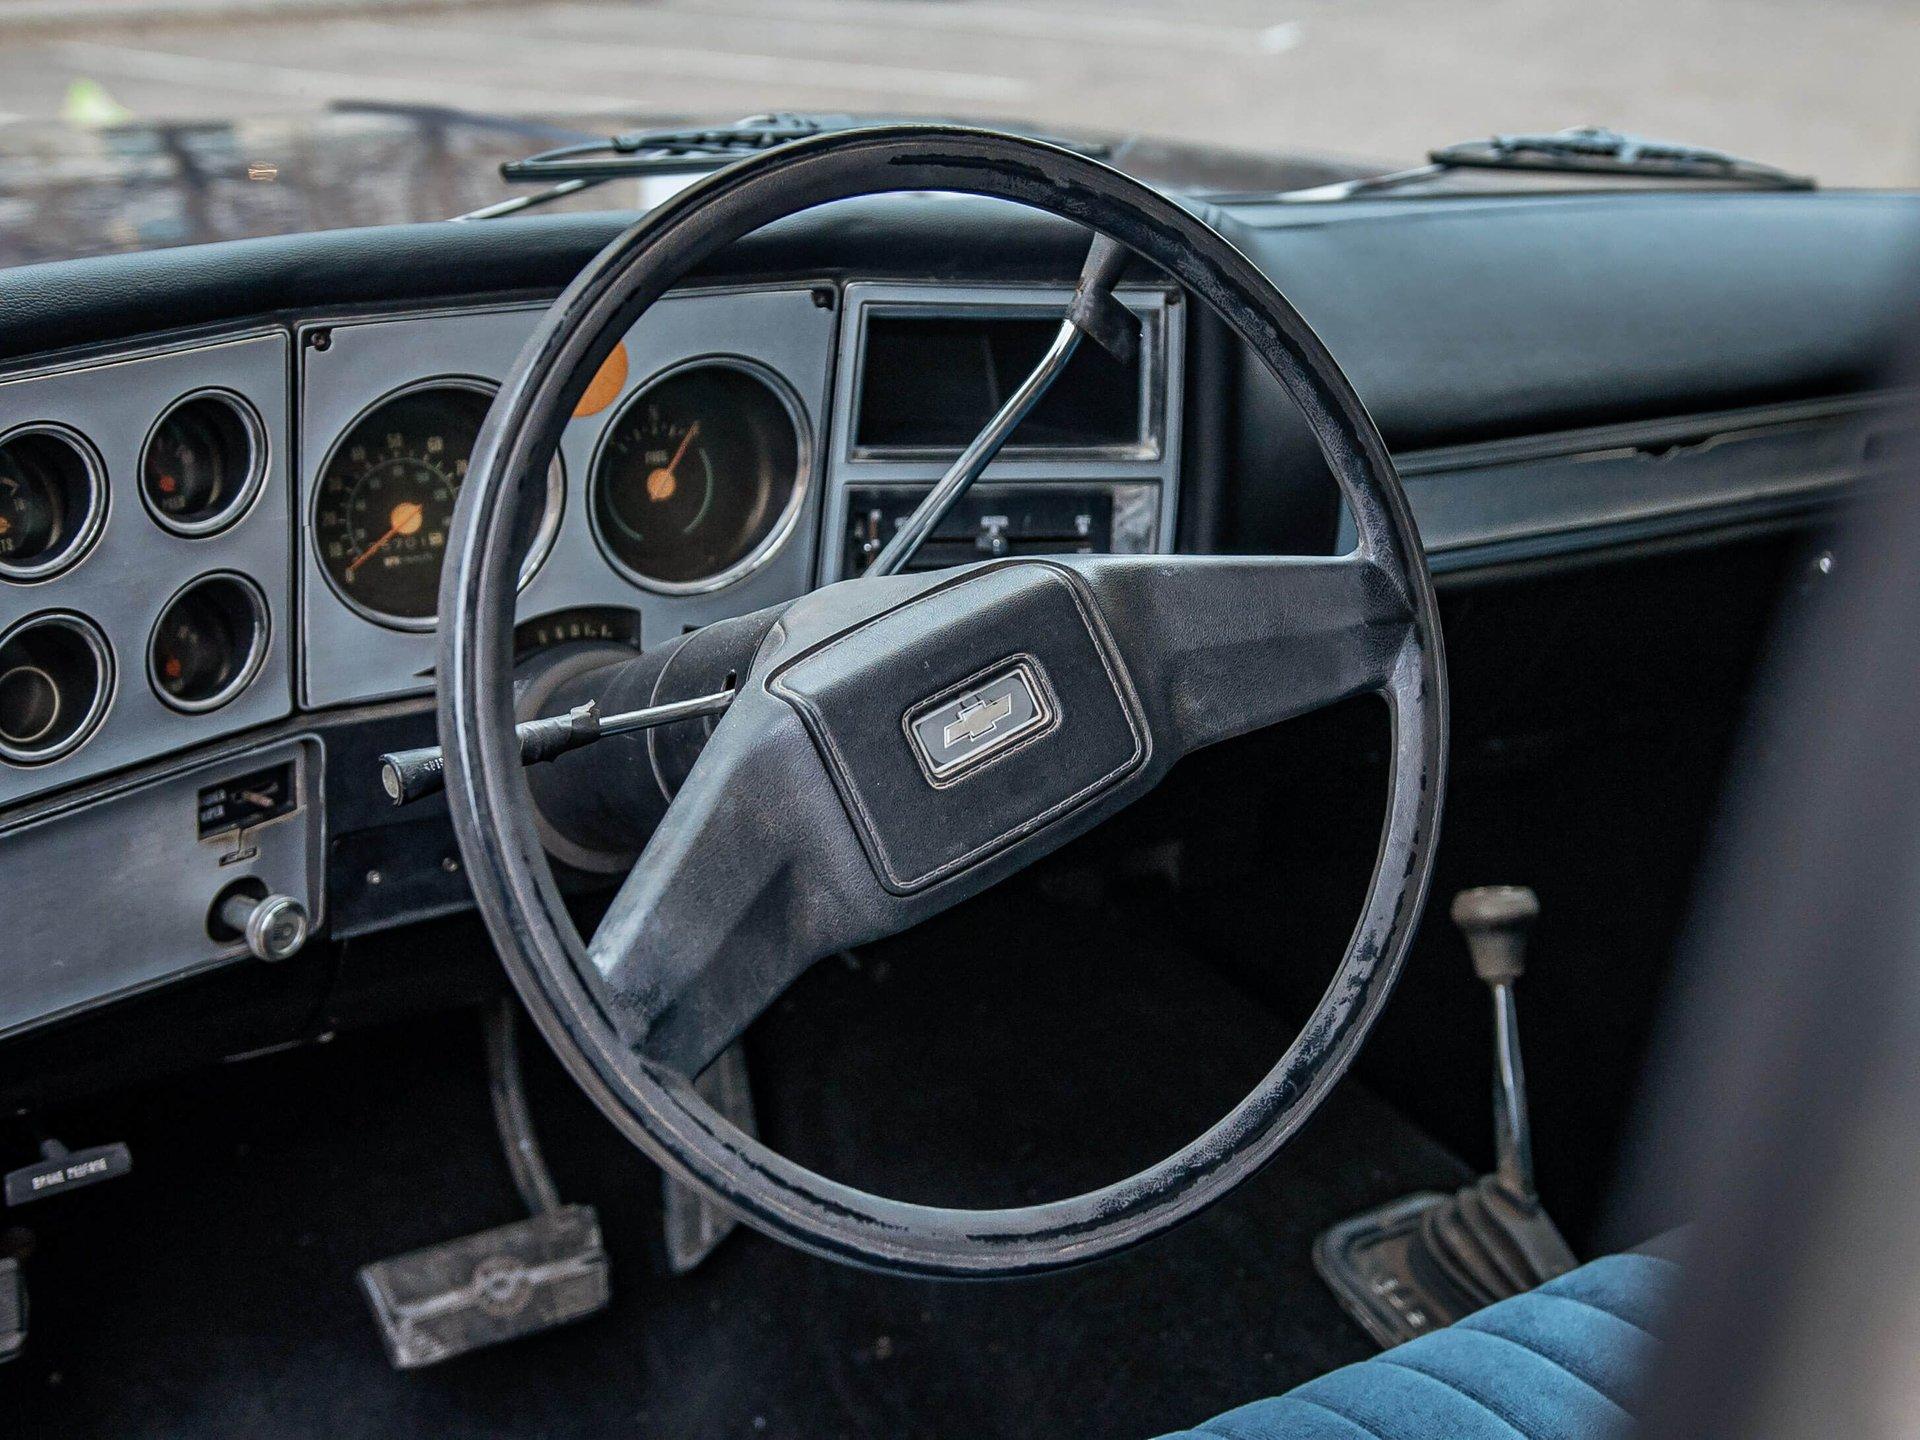 1978 Chevrolet K-10